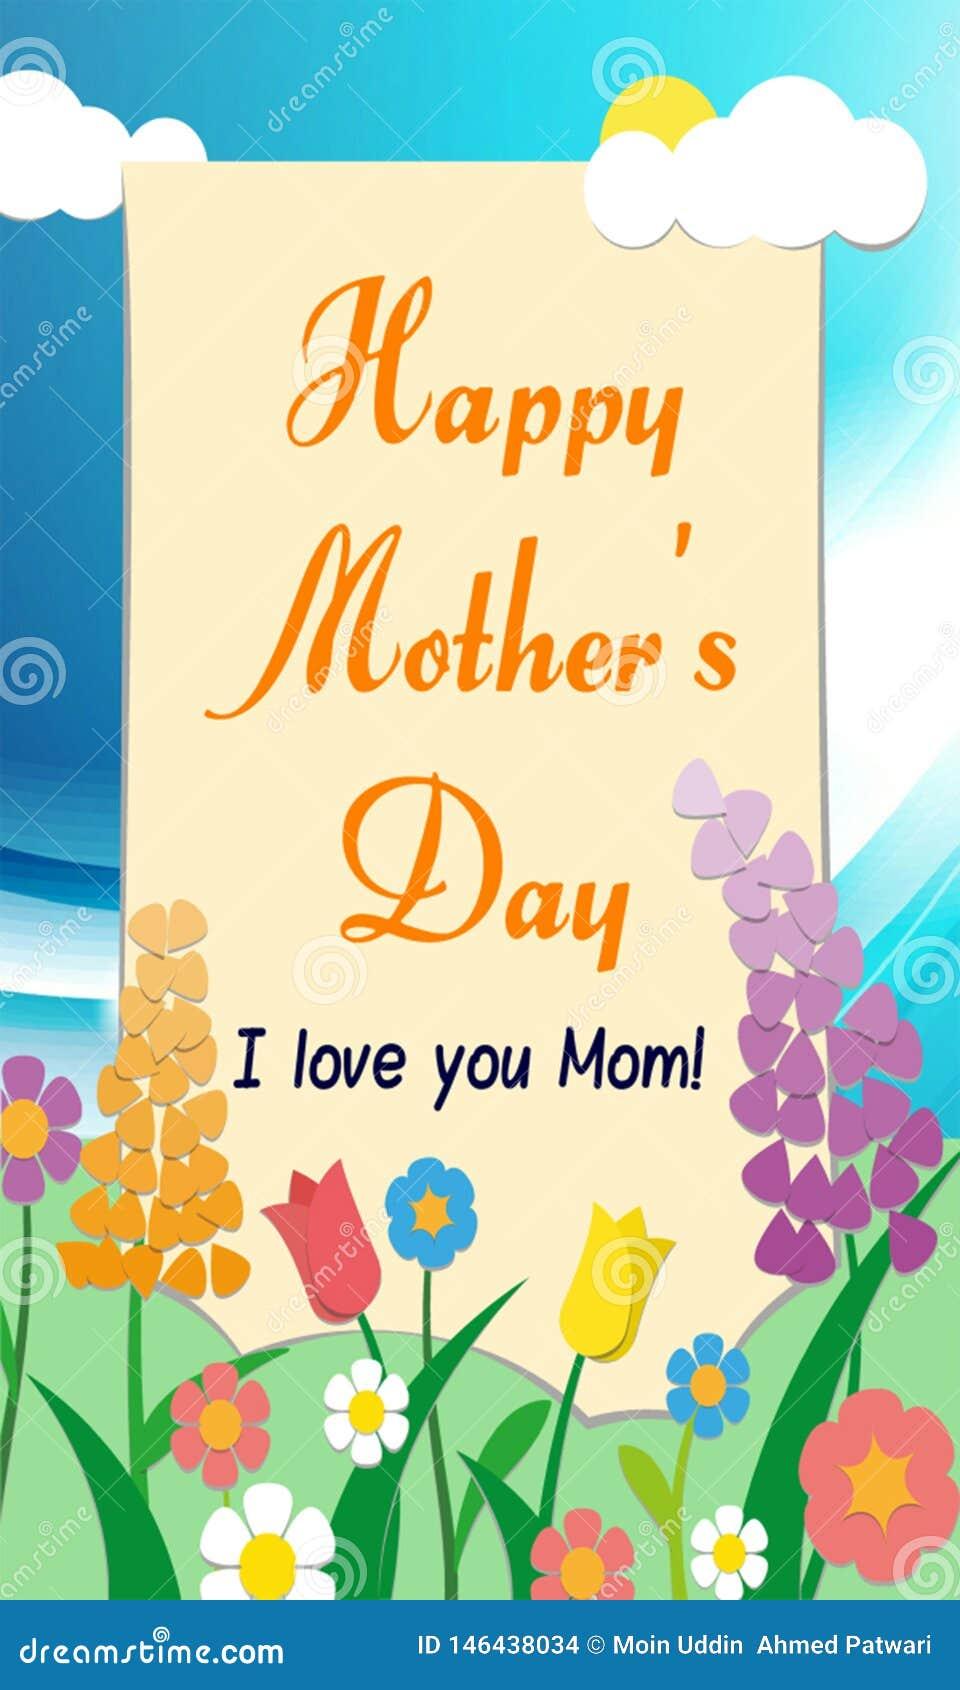 Celebraci?n feliz 2019 del d?a de madre desearle al d?a de madre feliz